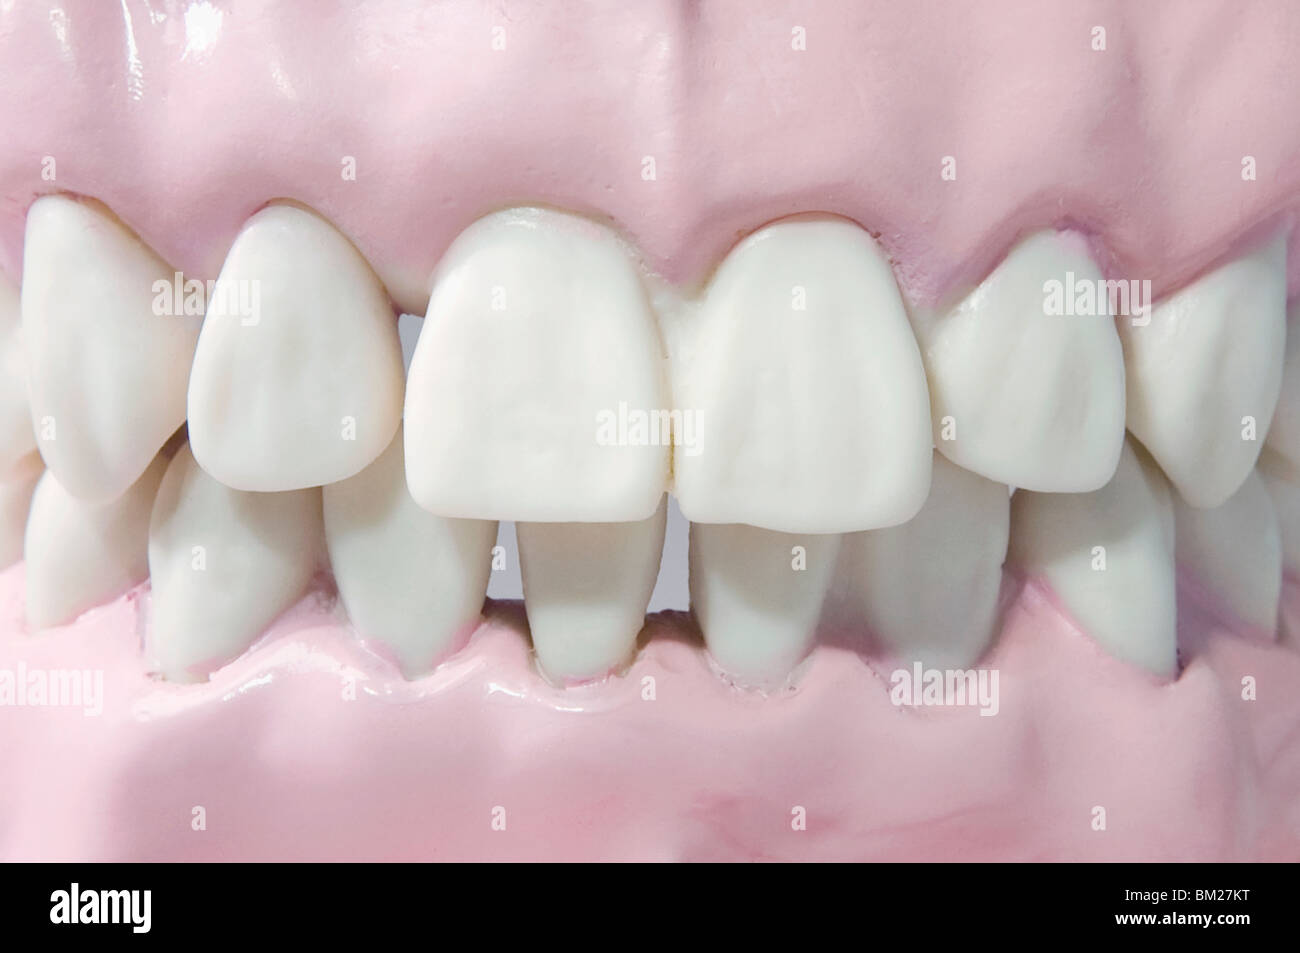 Full Set Human Teeth Stock Photos Full Set Human Teeth Stock